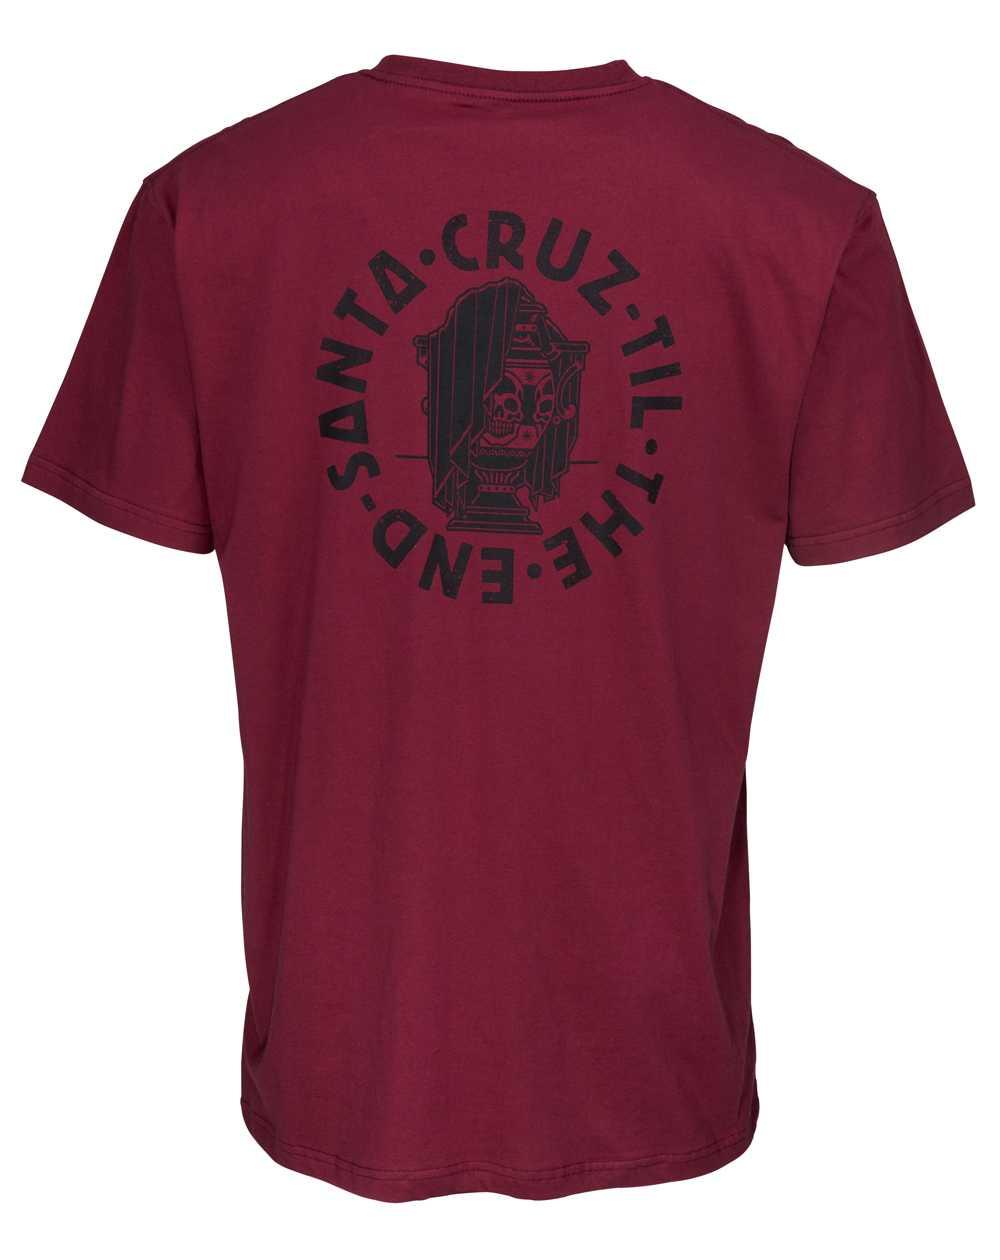 Santa Cruz Herren T-Shirt Til The End Burgundy